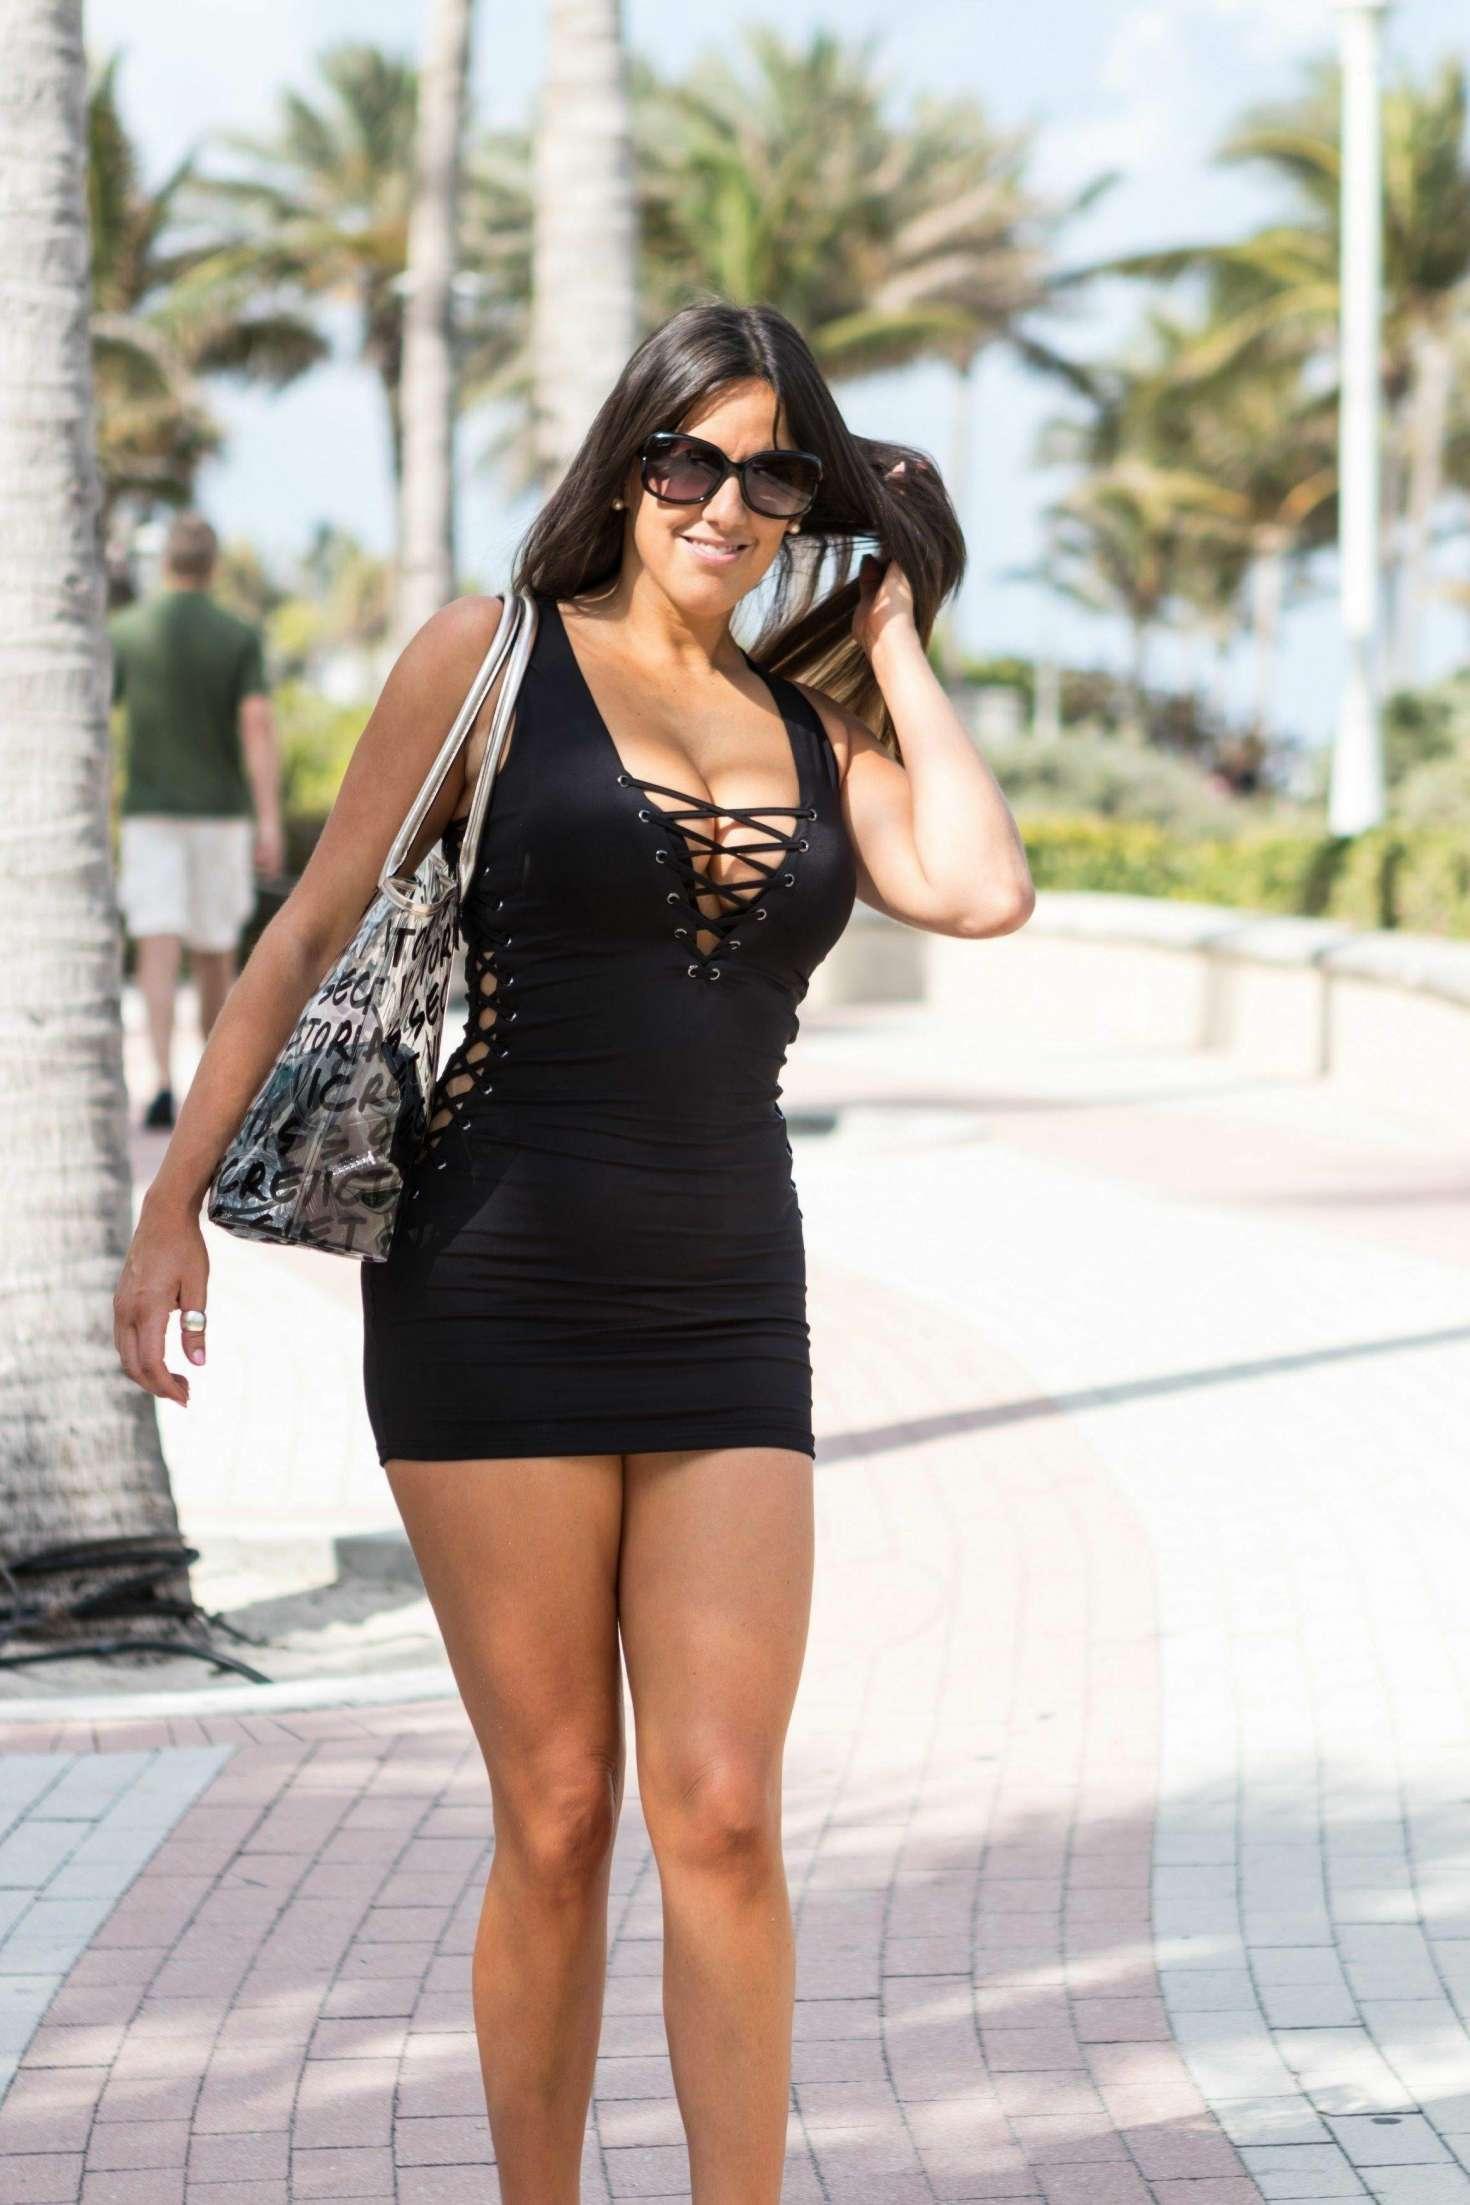 Claudia Romani In Black Mini Dress 06 Gotceleb